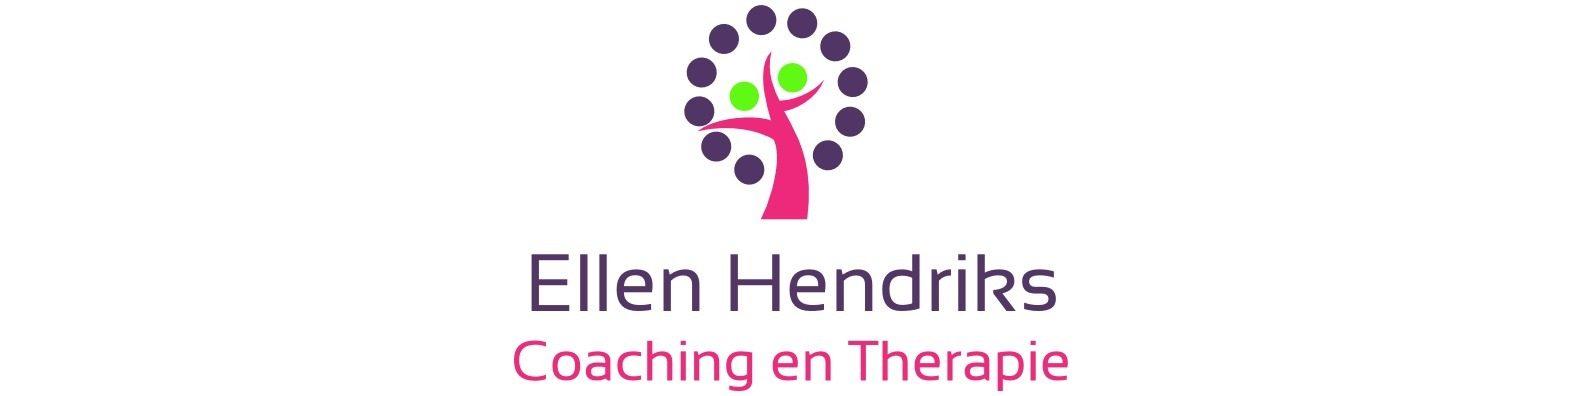 hendrikscoaching, coaching Assen, Assen help, ik zoek hulp Assen